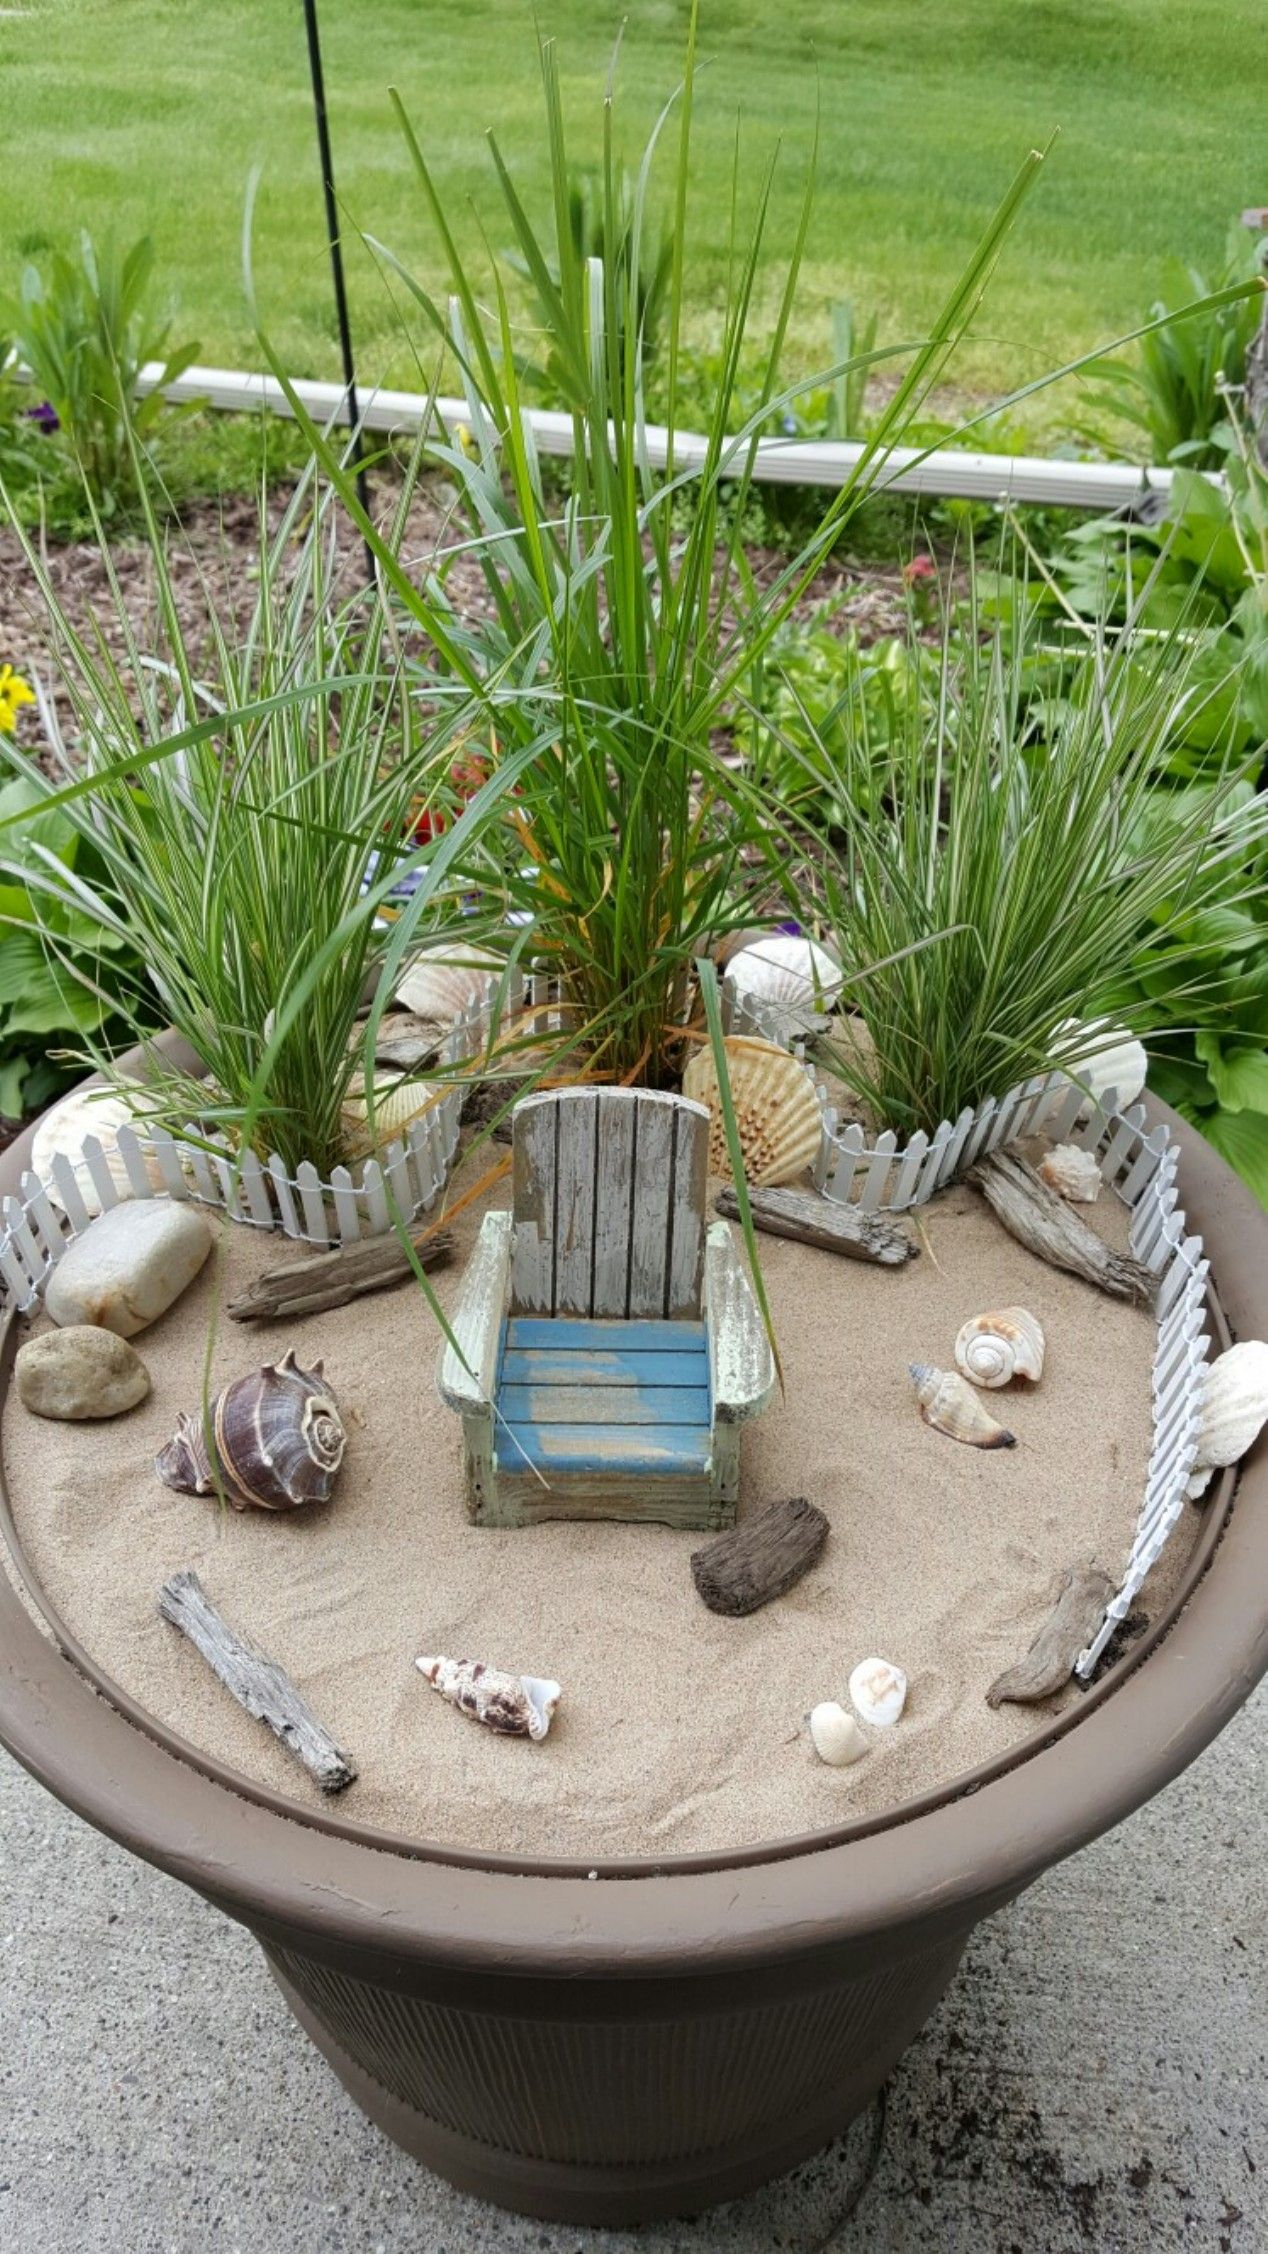 Fairy Gardens also called miniature gardens are